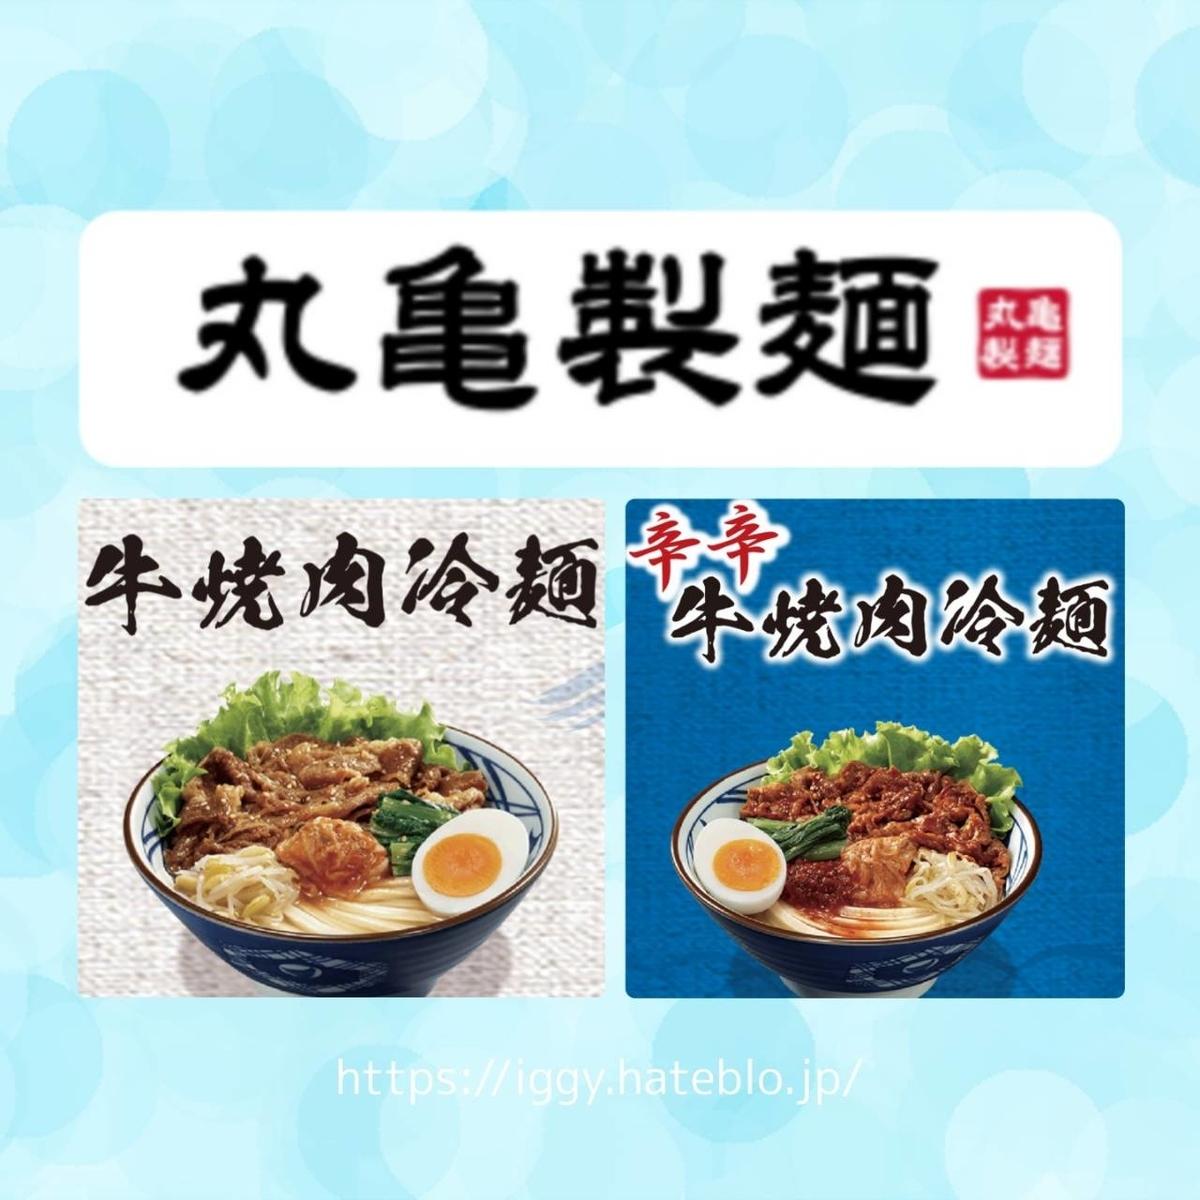 丸亀製麺 期間限定メニュー「牛焼肉冷麺」「辛辛 牛焼肉冷麺」 LIFE